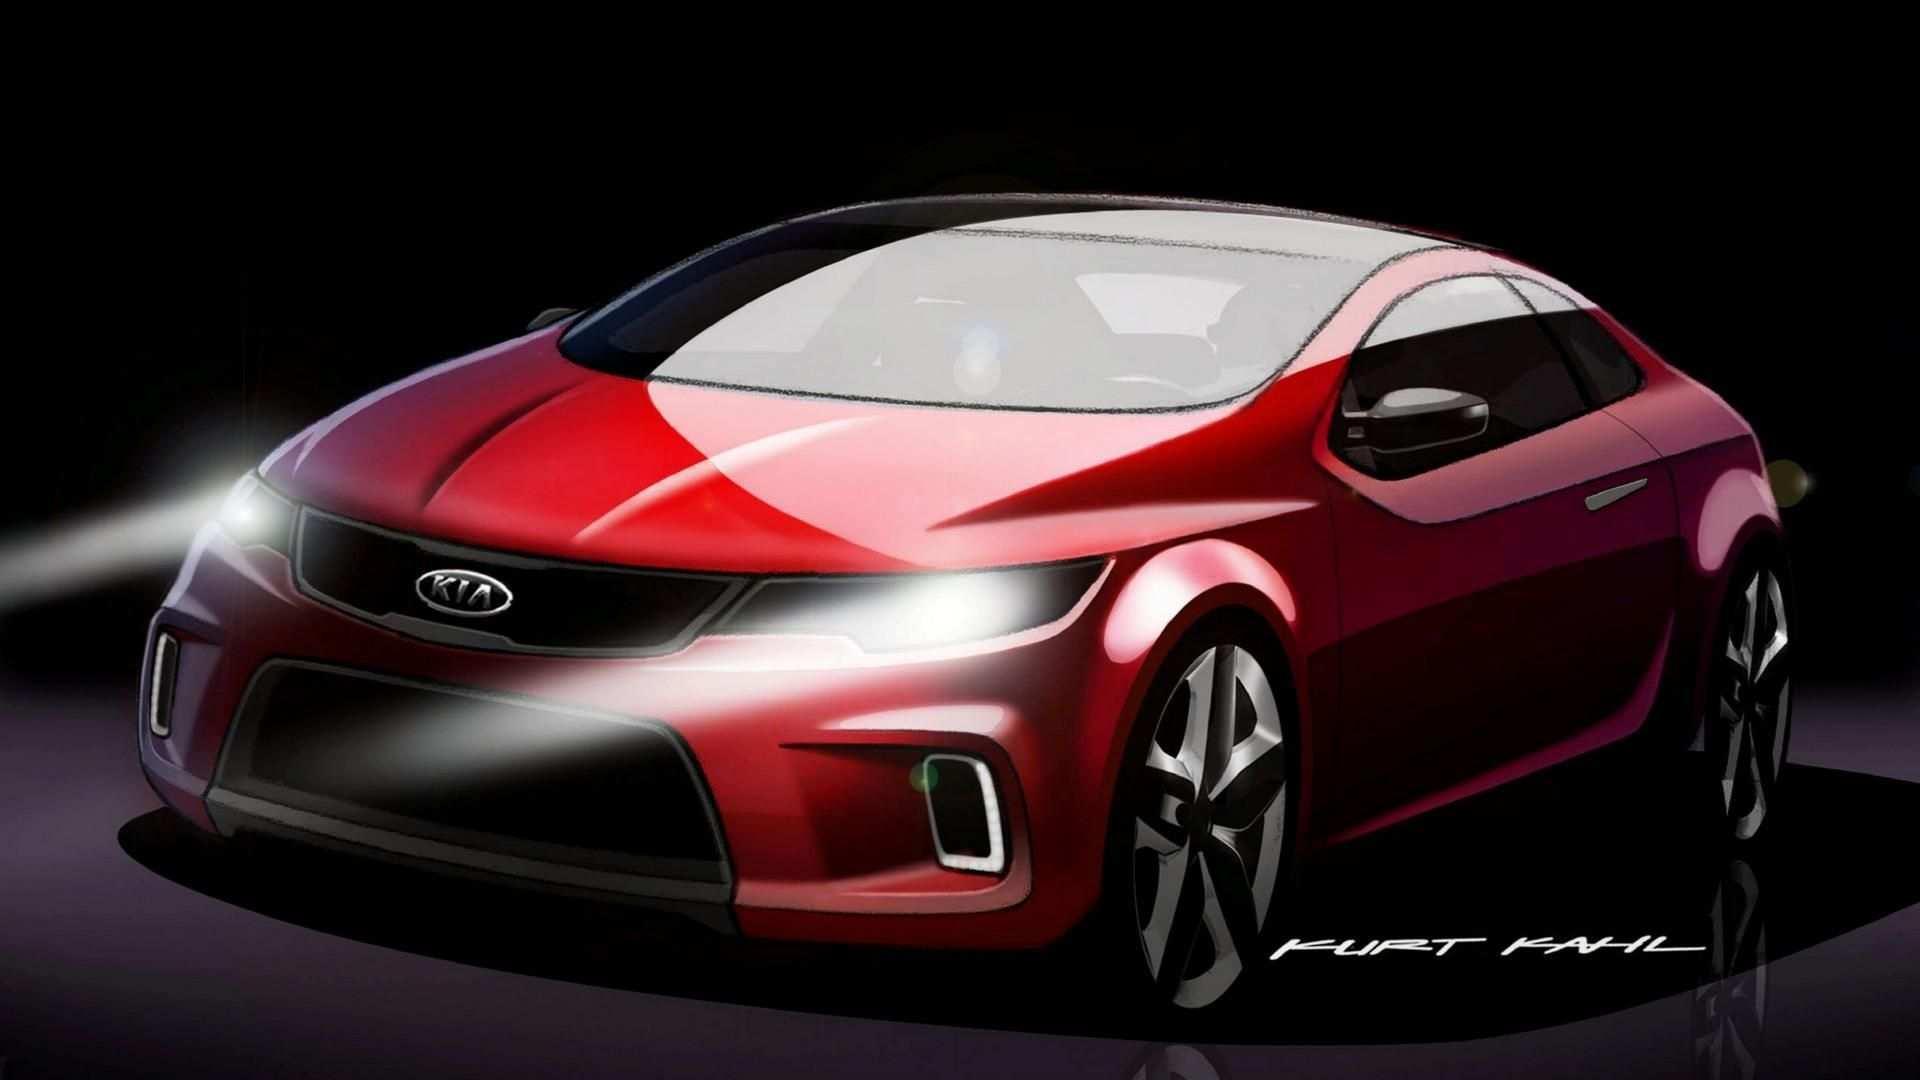 62 Great Kia Forte Koup 2020 Reviews by Kia Forte Koup 2020